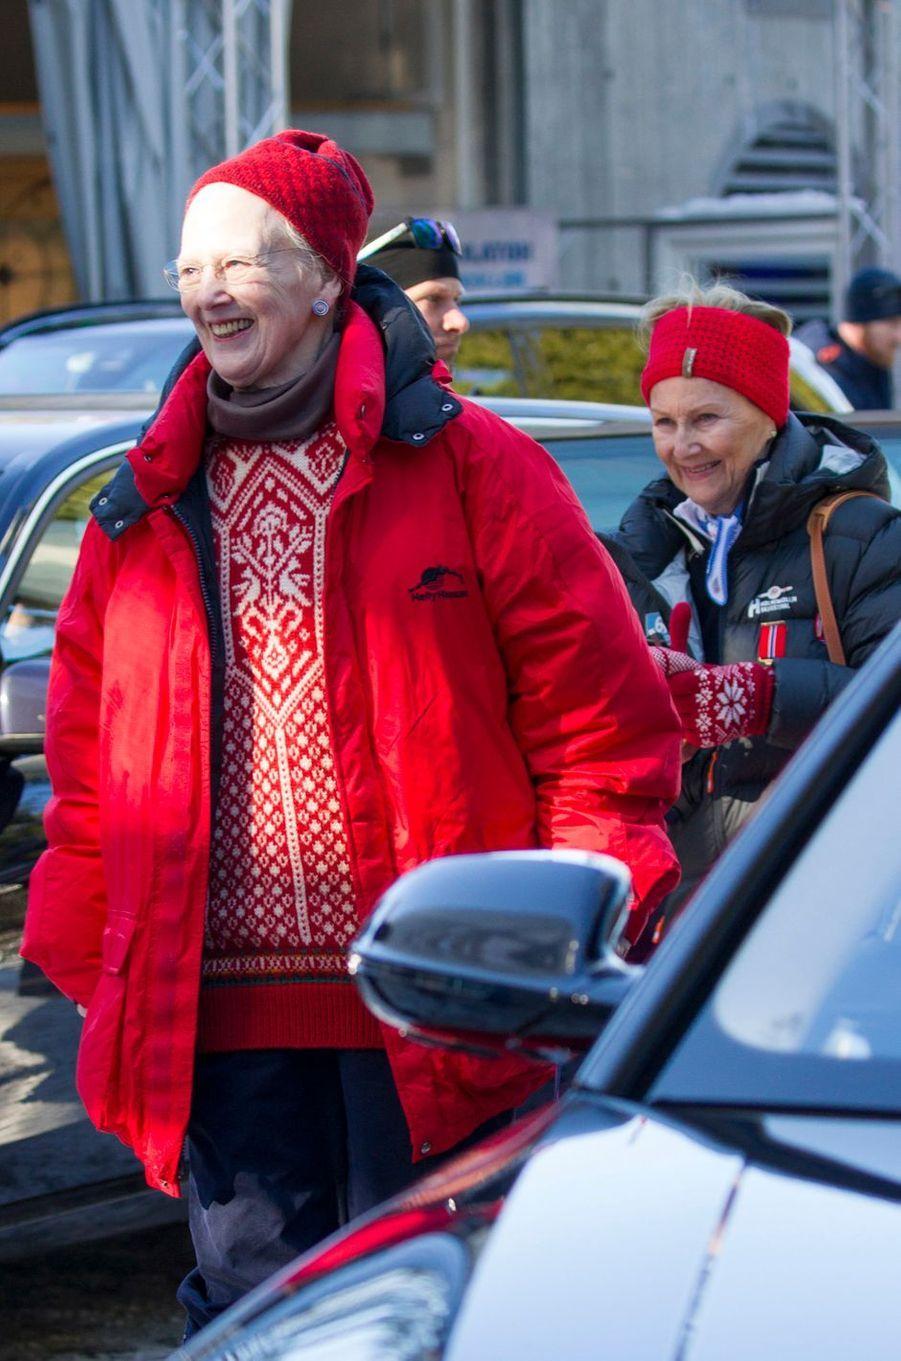 La reine Margrethe II de Danemark avec la reine Sonja de Norvège à Oslo, le 10 mars 2019